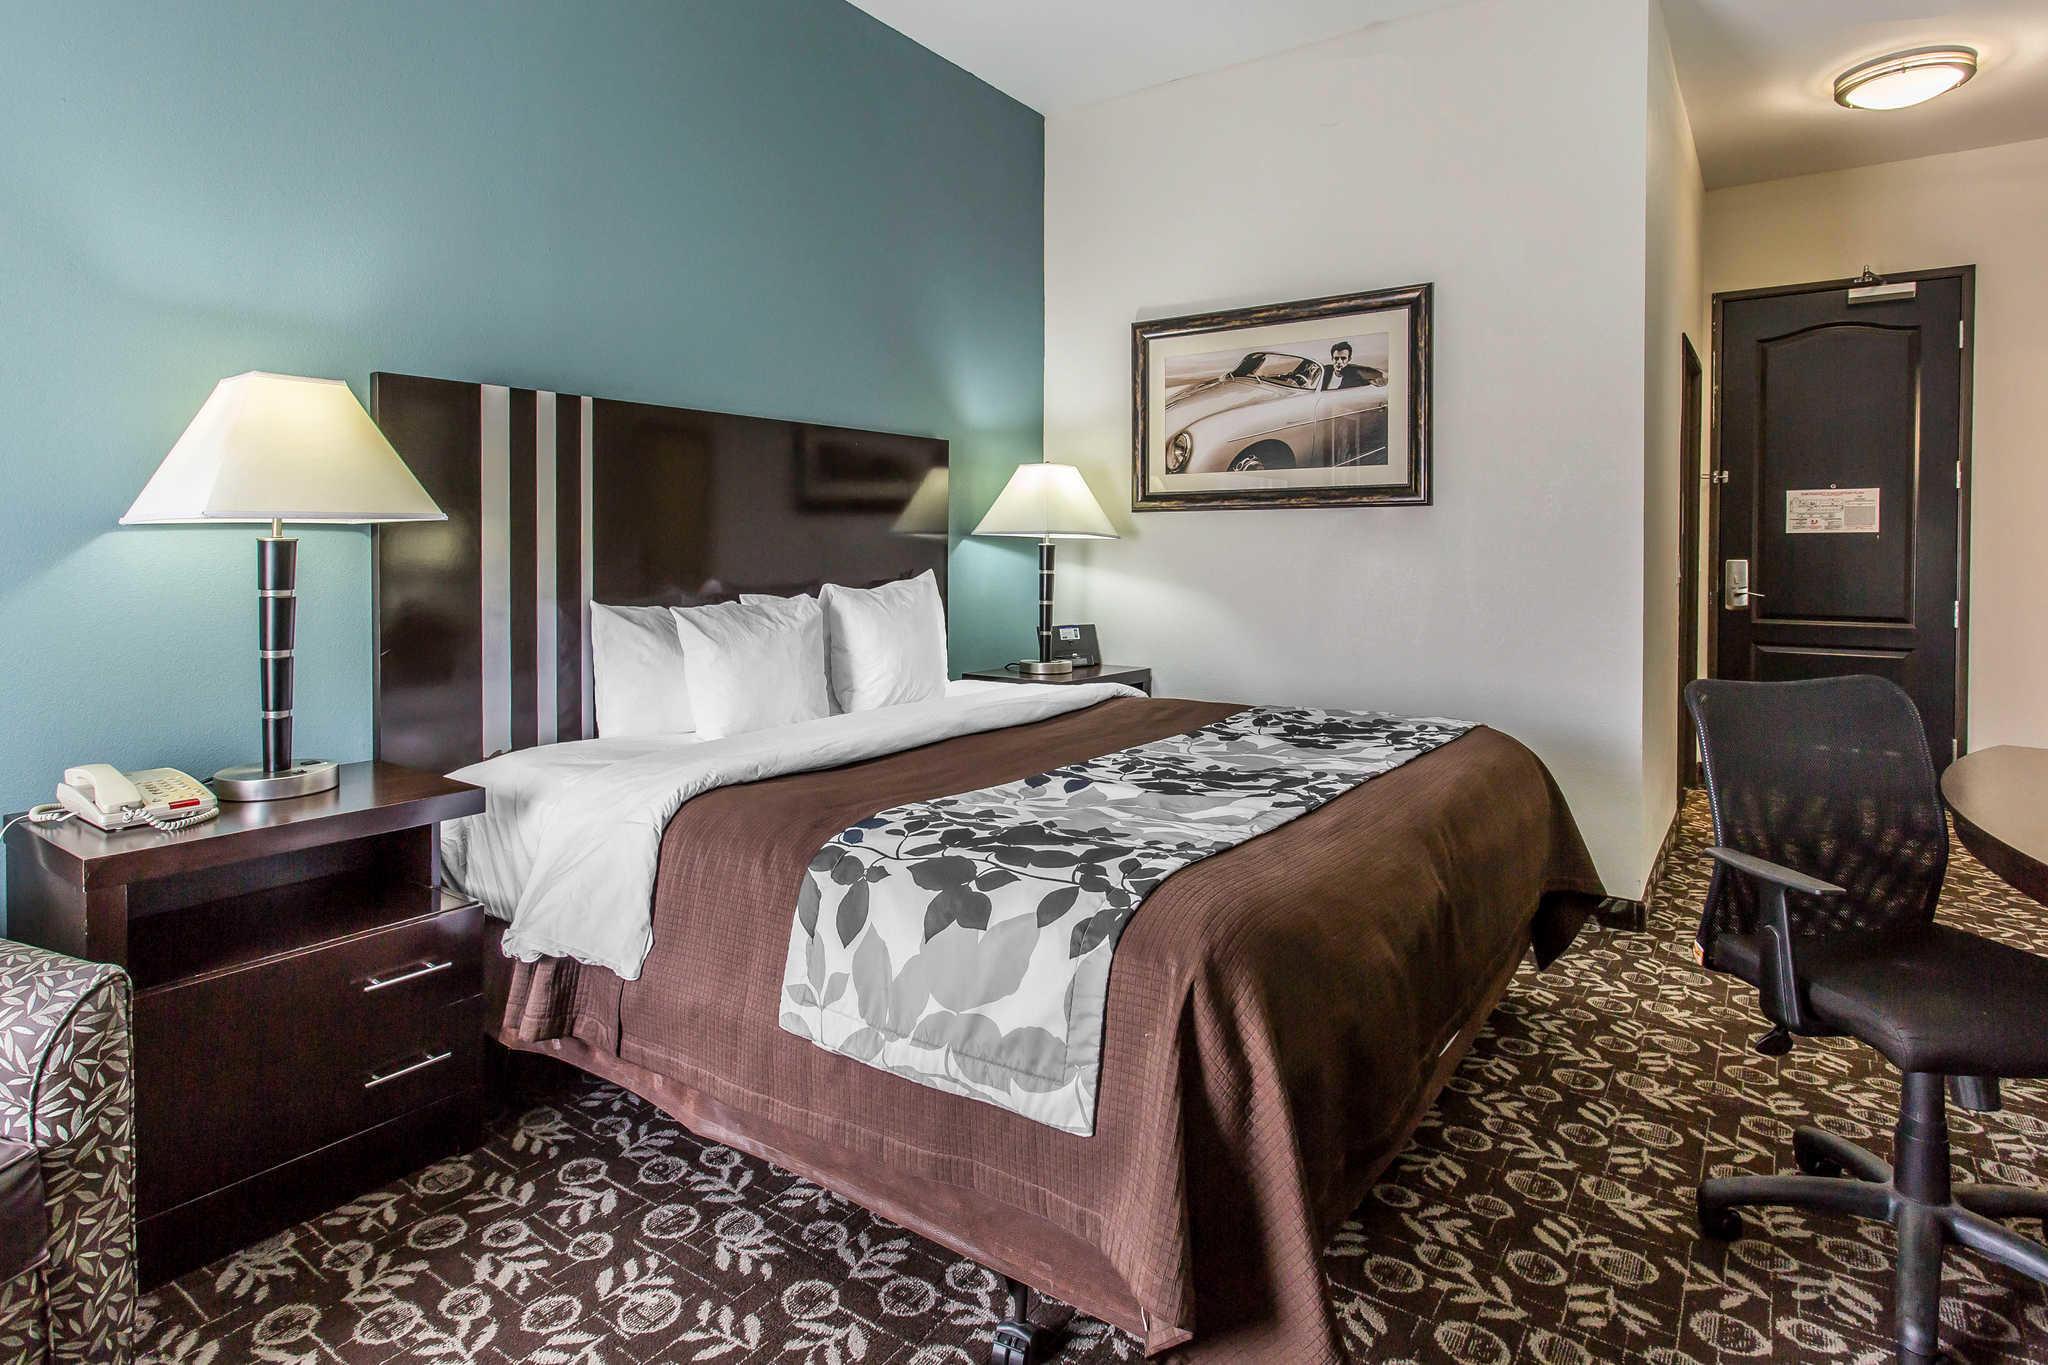 Sleep Inn & Suites West Medical Center image 11